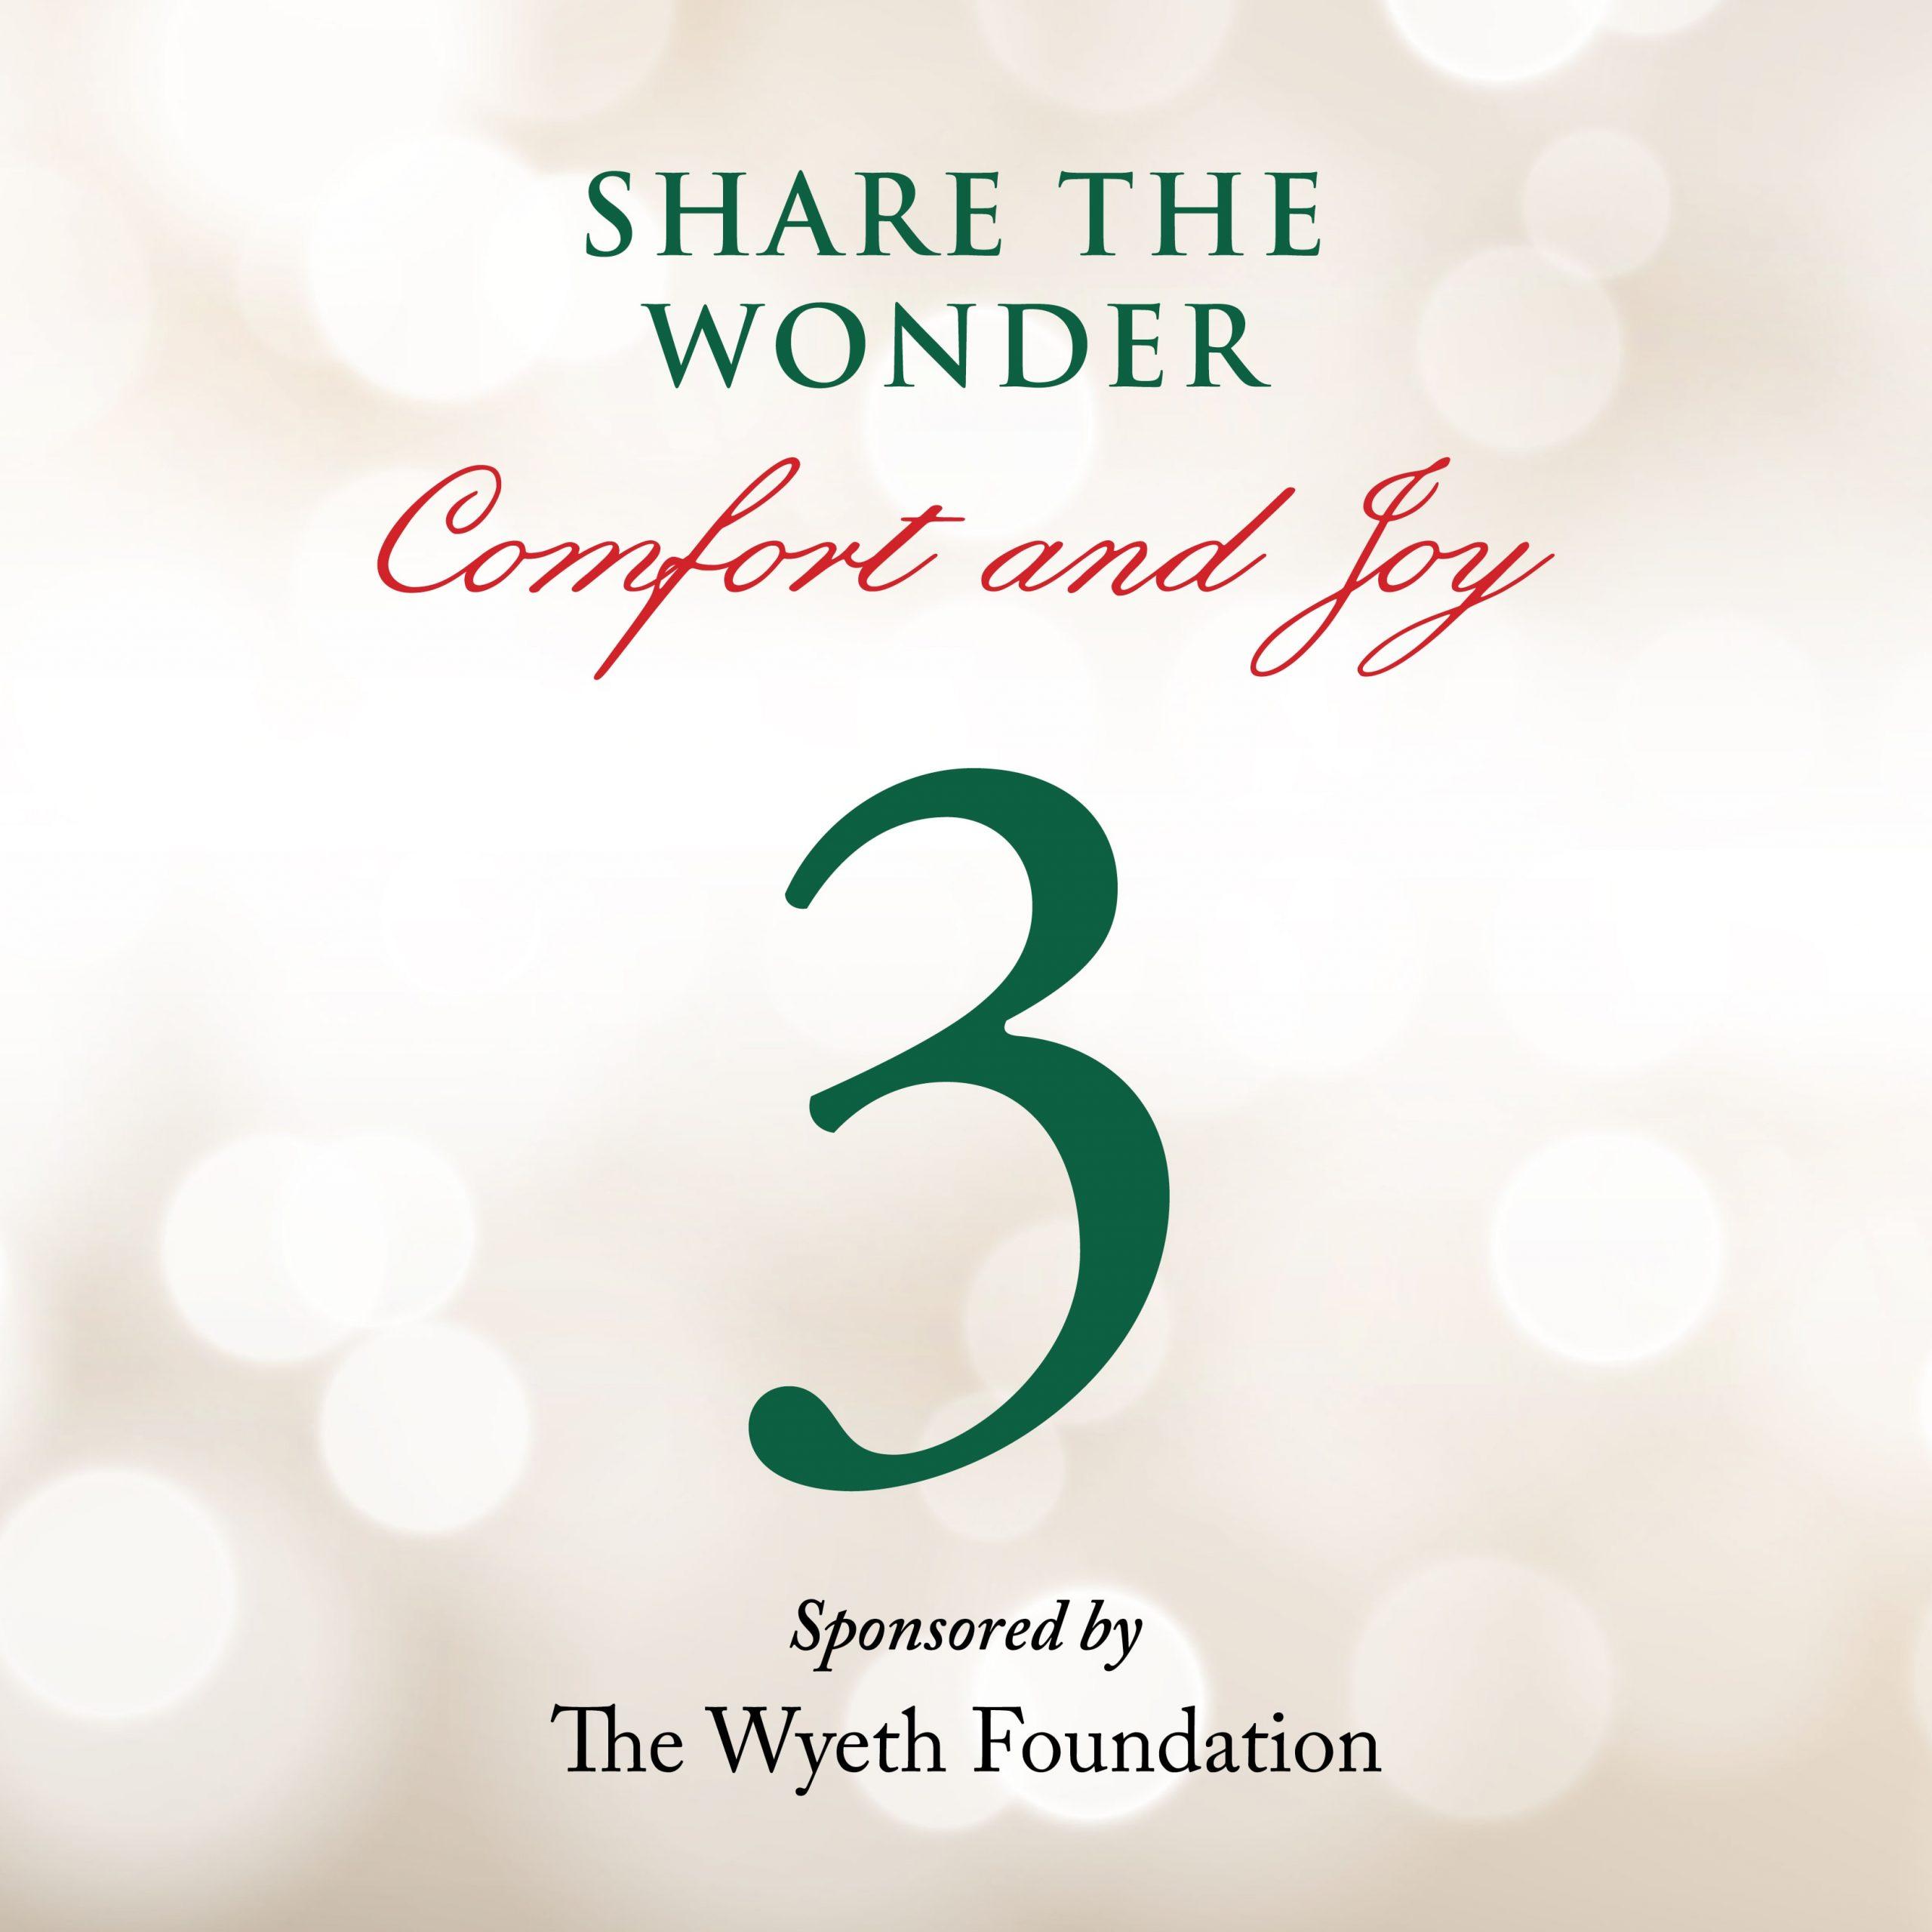 Day 3 of Share the Wonder: November 30